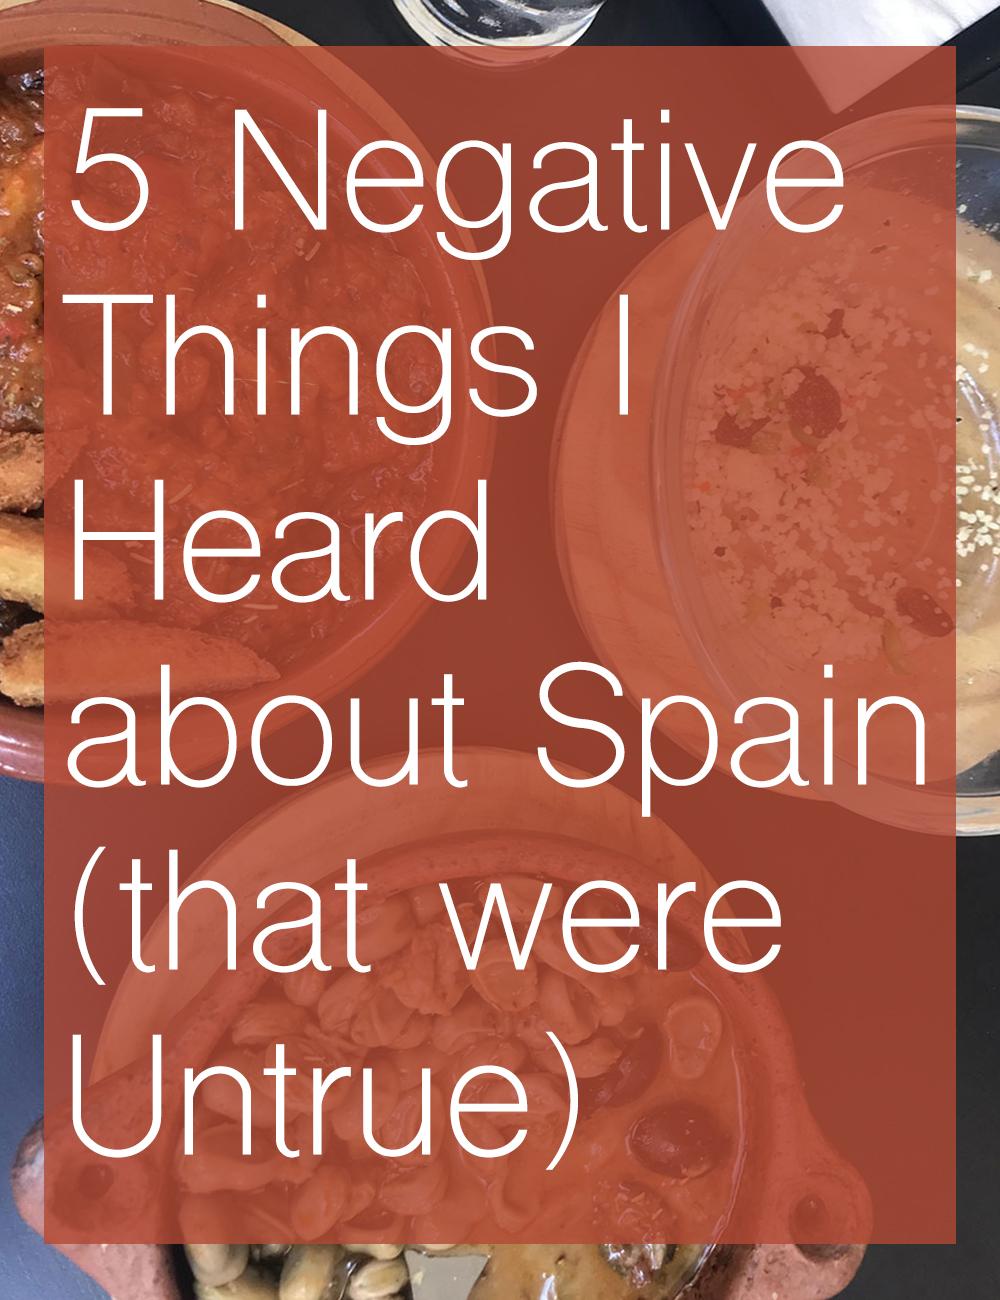 5 Negative Things I Heard about Spain (that were Untrue)